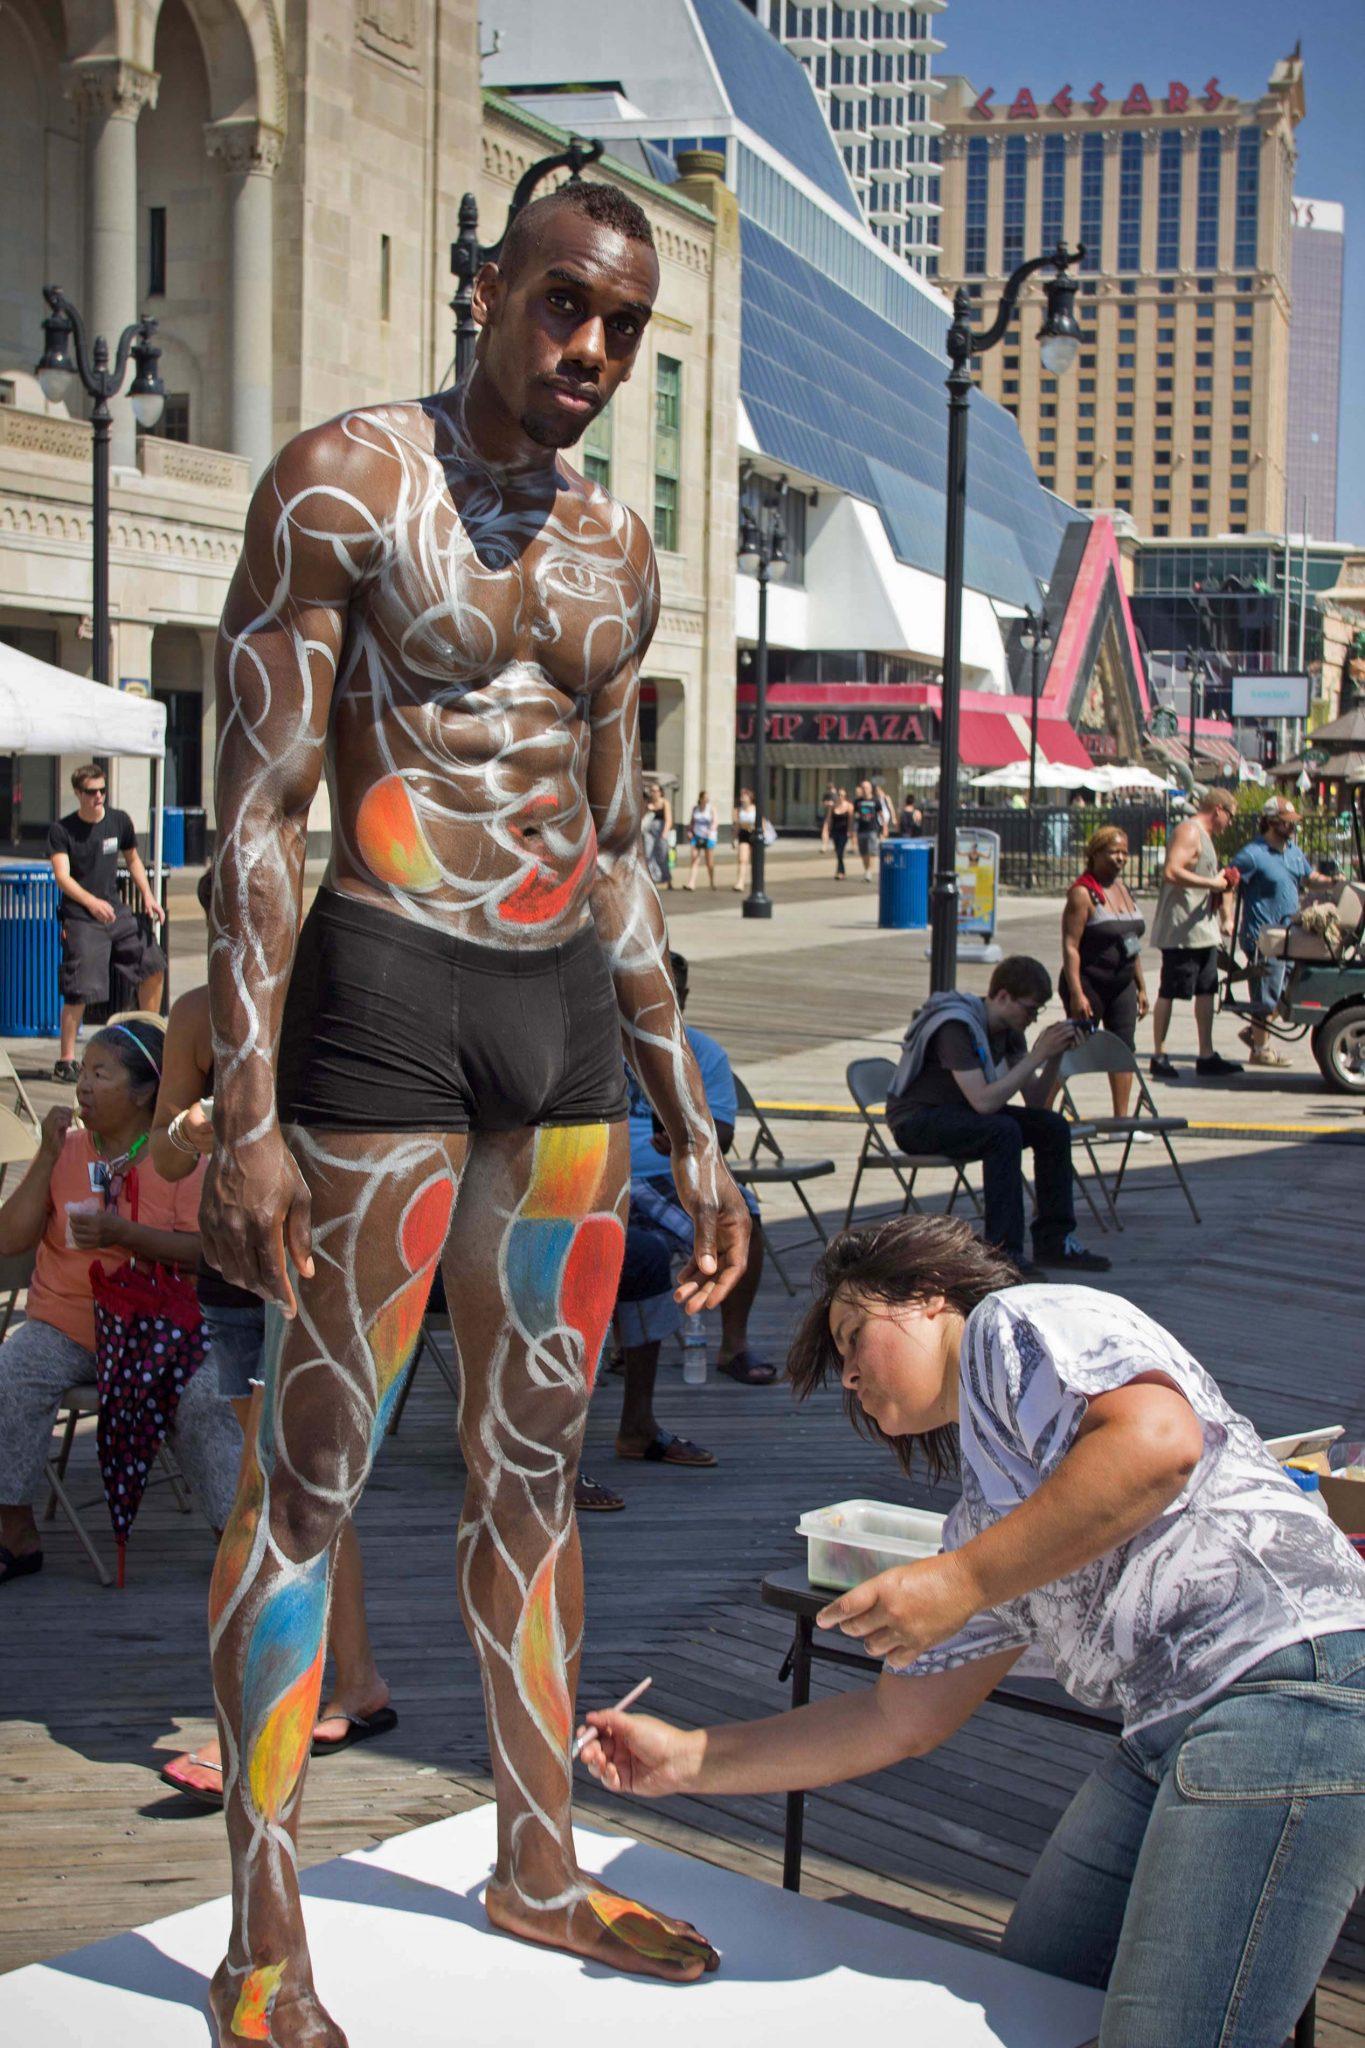 2014 Atlantic City Boardwalk Art Show - Body Artist Heather Deegan Hire